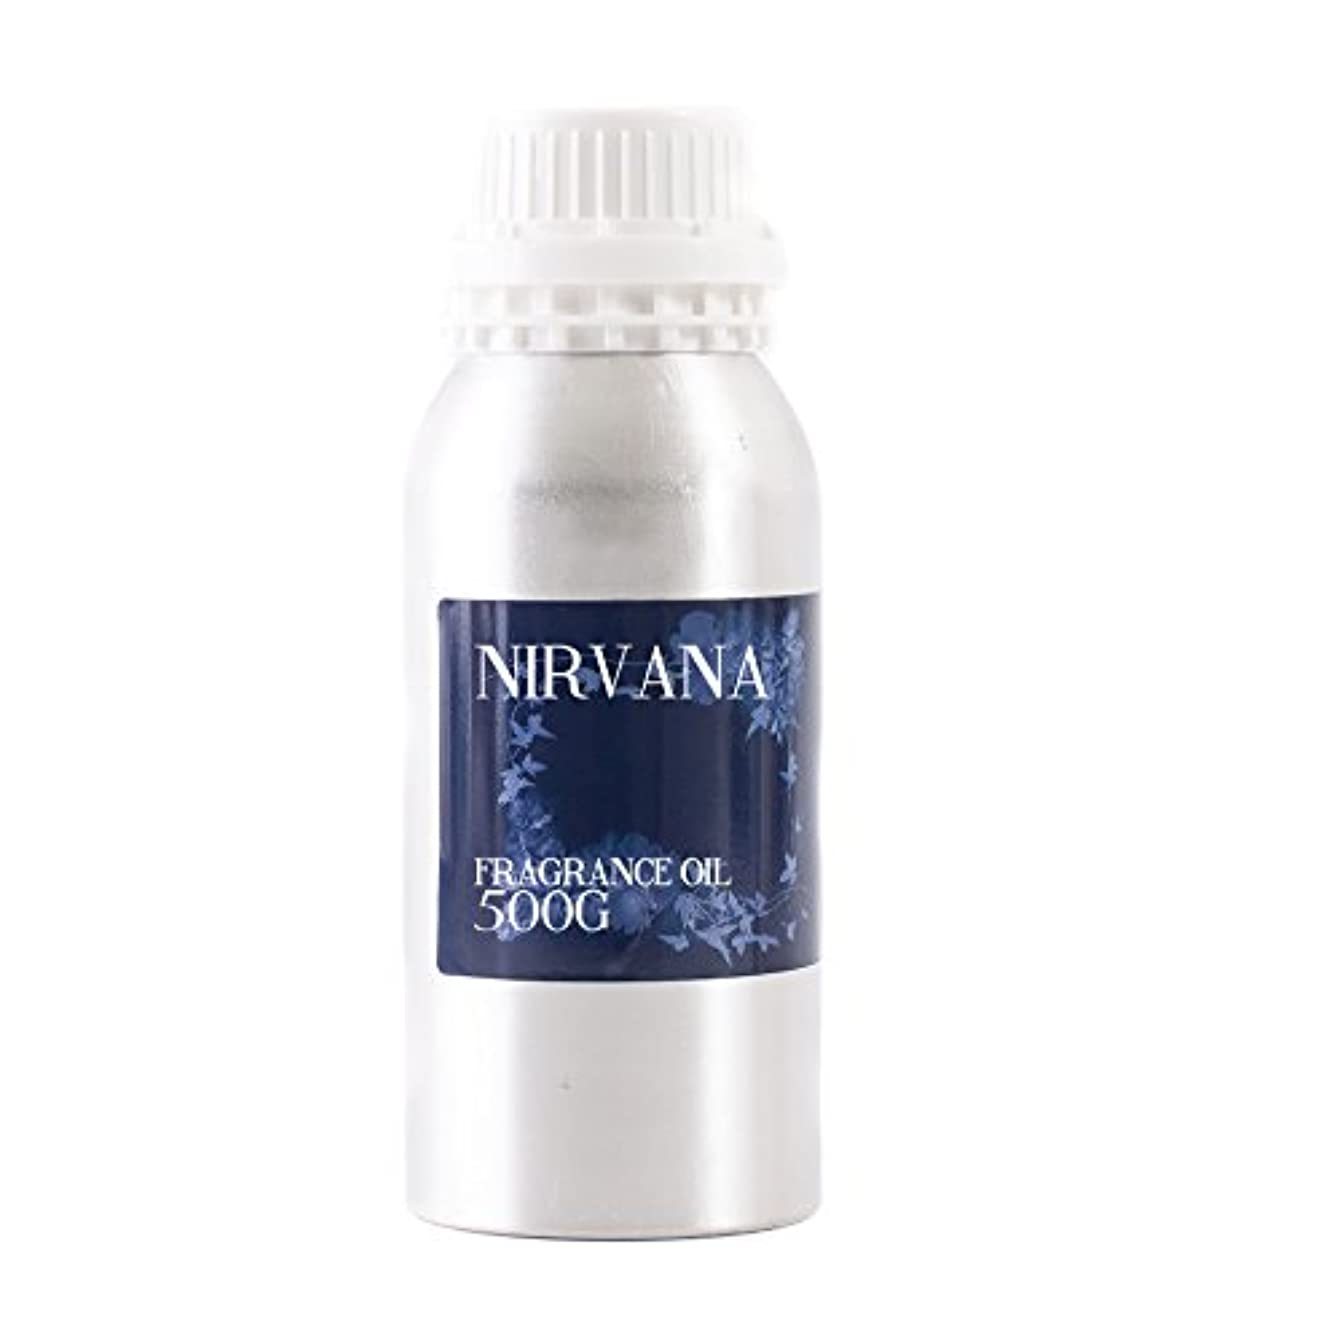 Mystic Moments | Nirvana Fragrance Oil - 500g